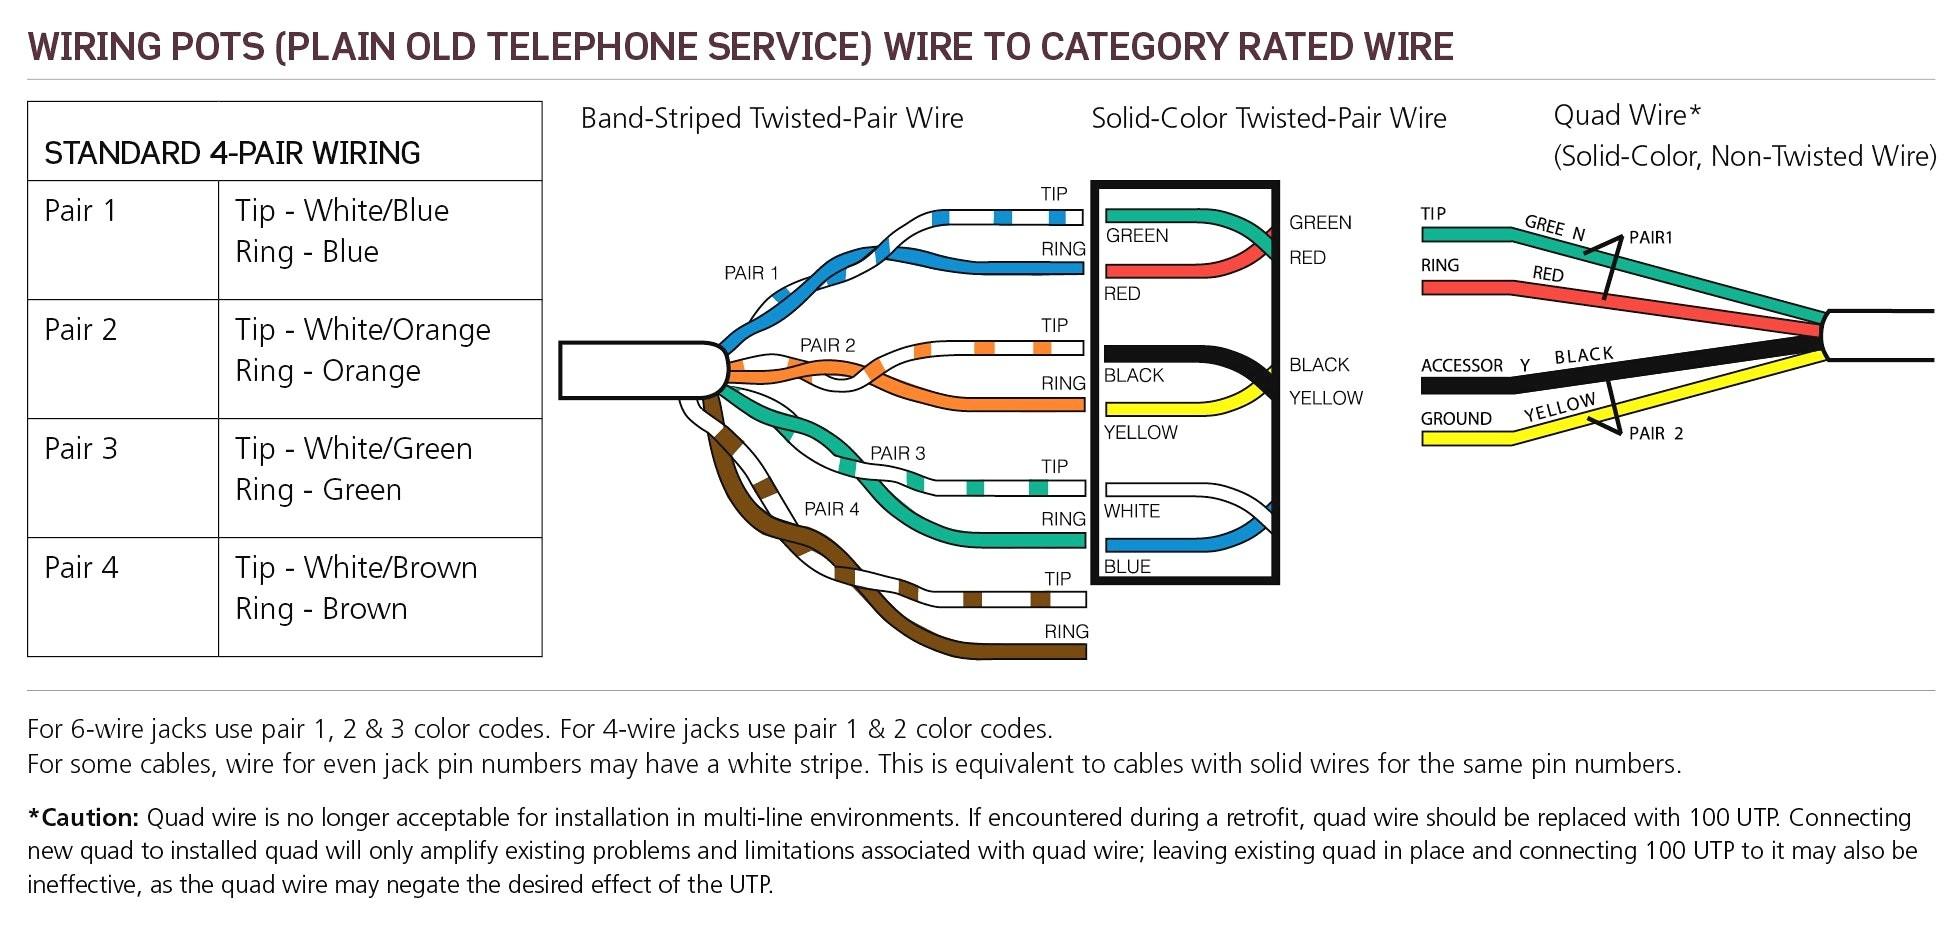 ... with cat 3 wiring diagram images of cat 5a wiring diagram wire rh  estilomagico co cat